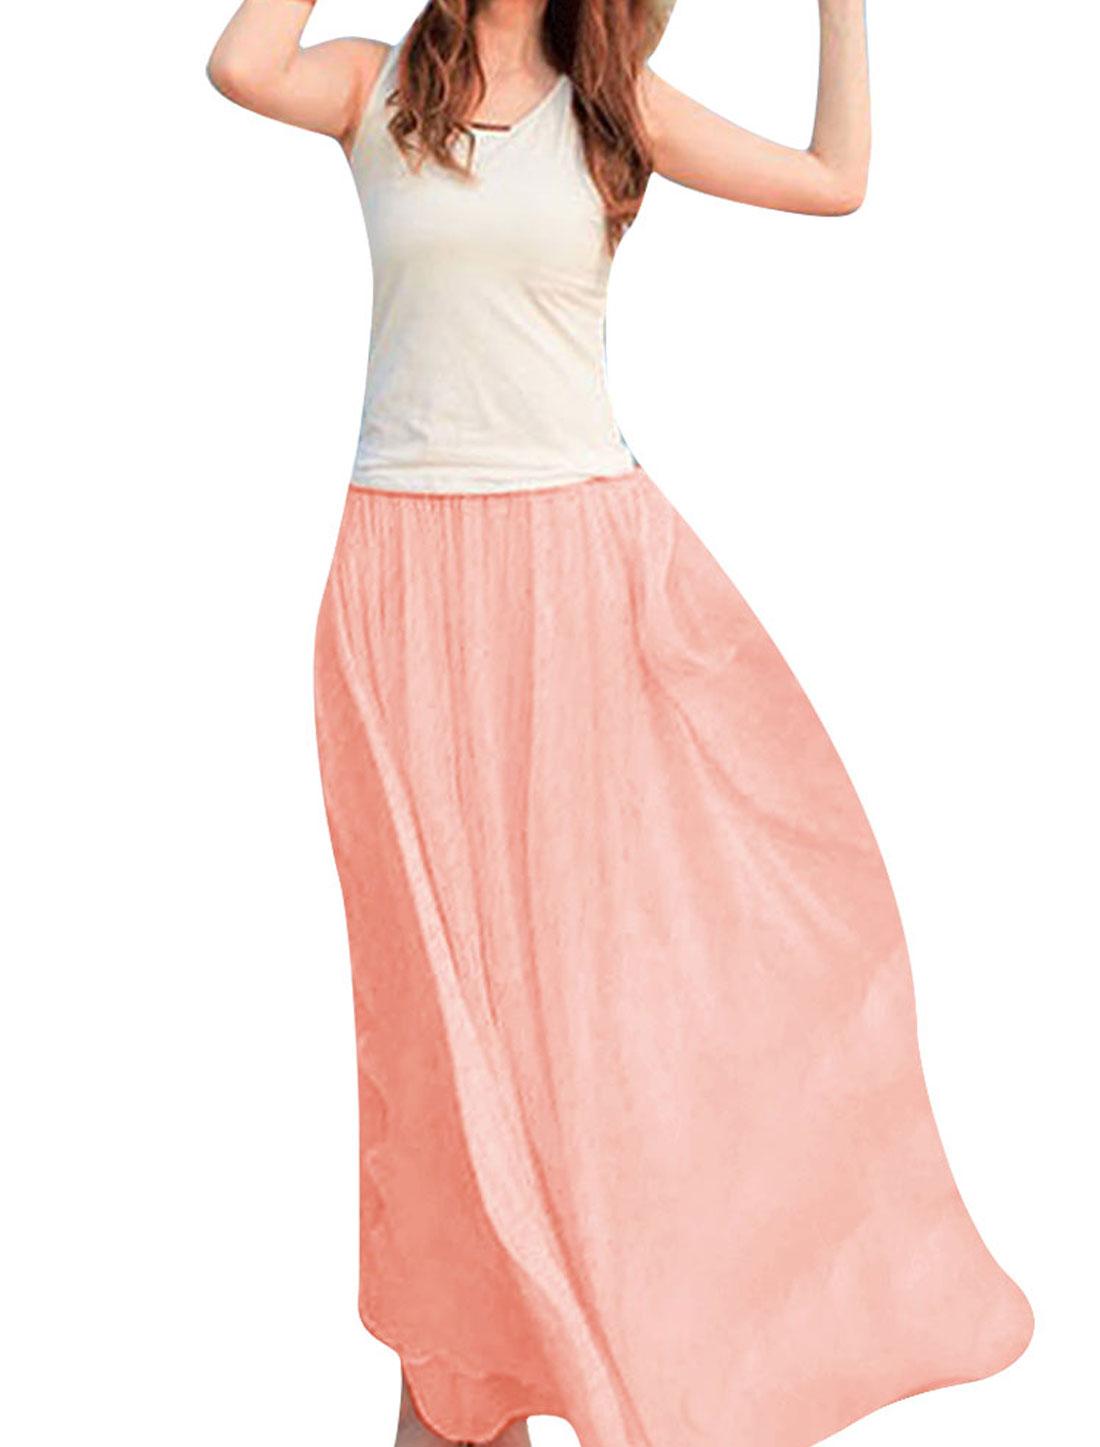 Women Lining Full-Length Summer Skirt Pink XS